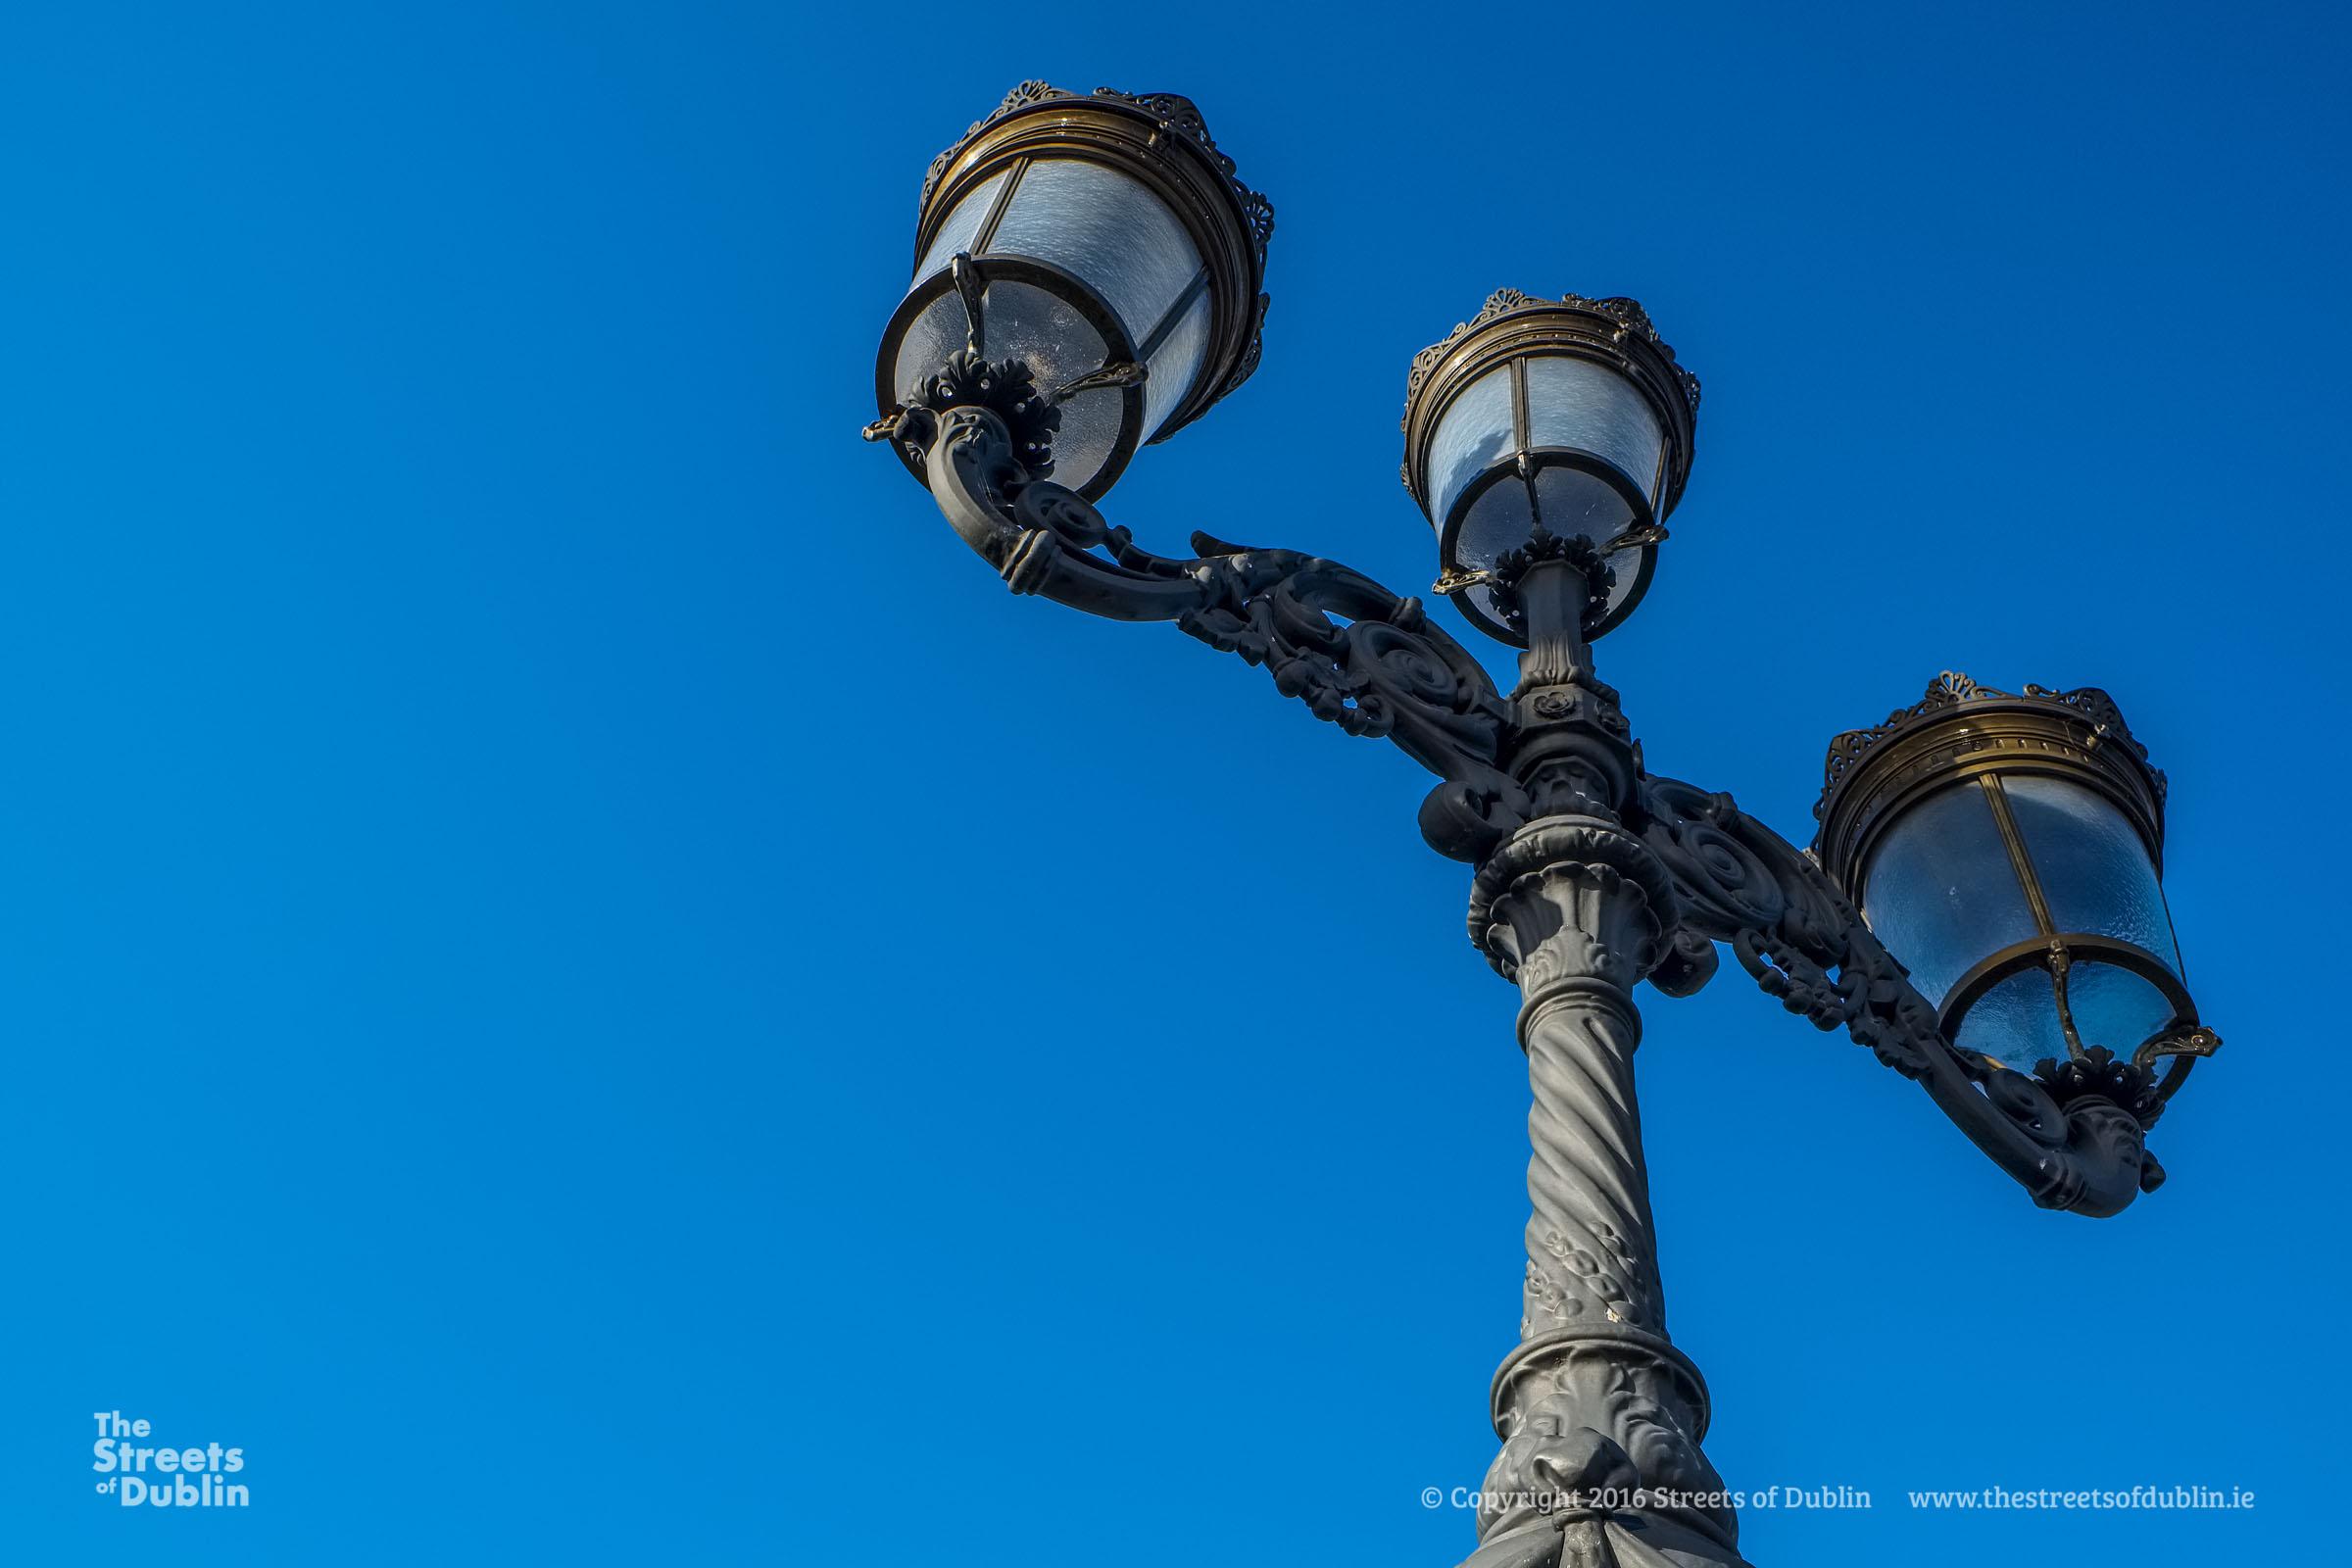 Streets-of-Dublin-Photo-2-177.jpg